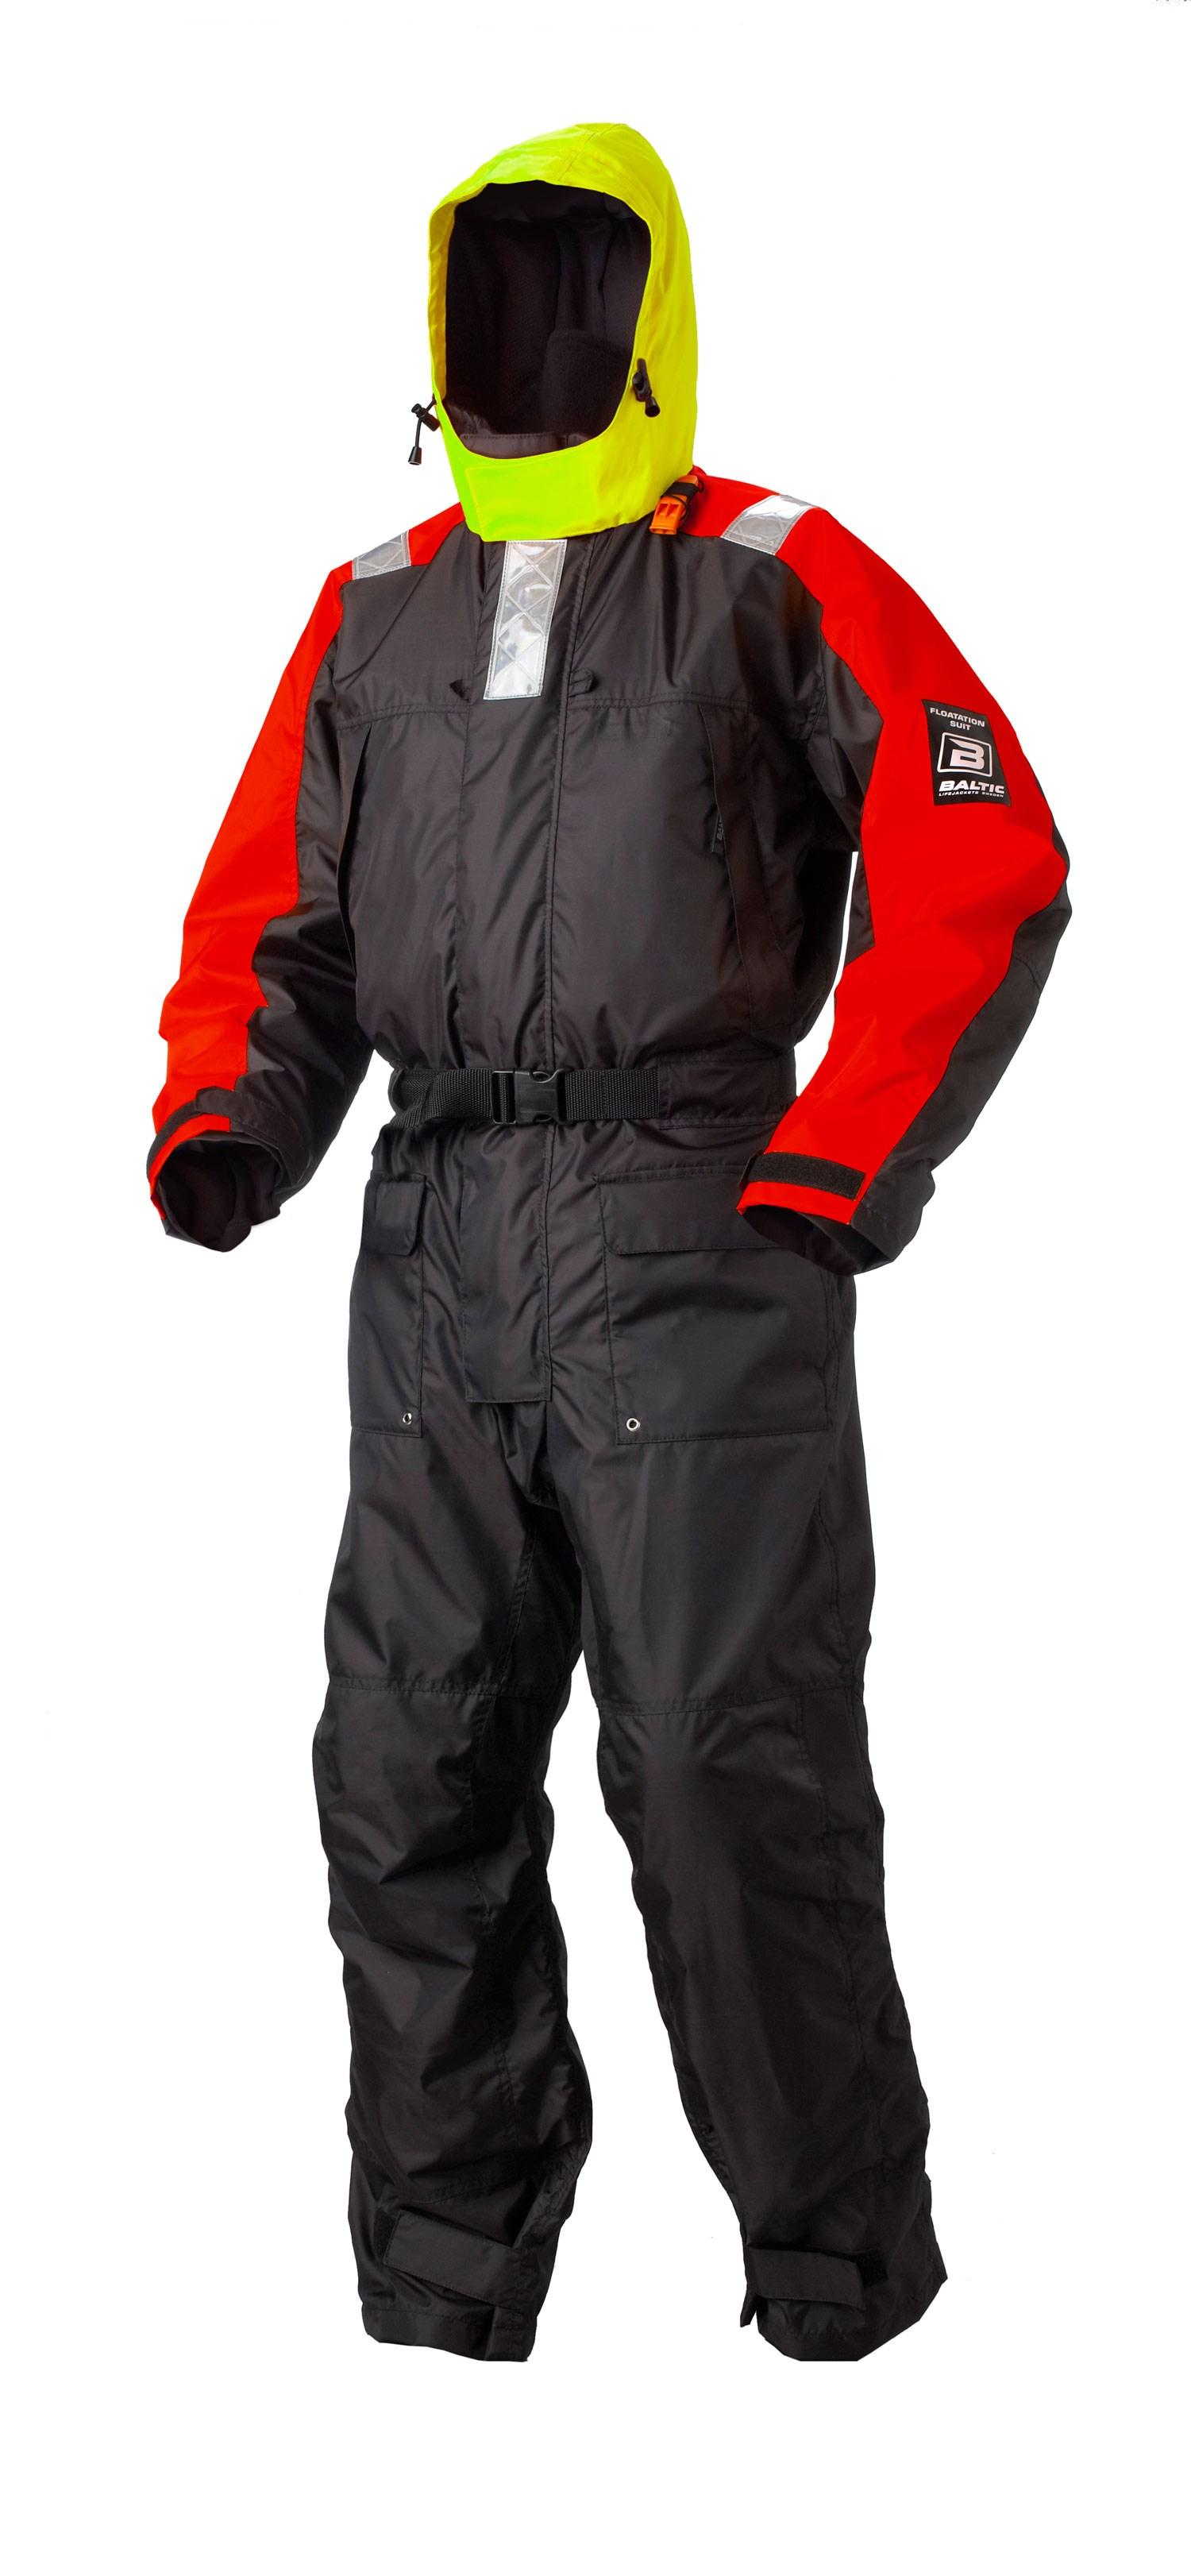 Baltic Flytoverall Amarok svart/röd Barn, 30-40kg